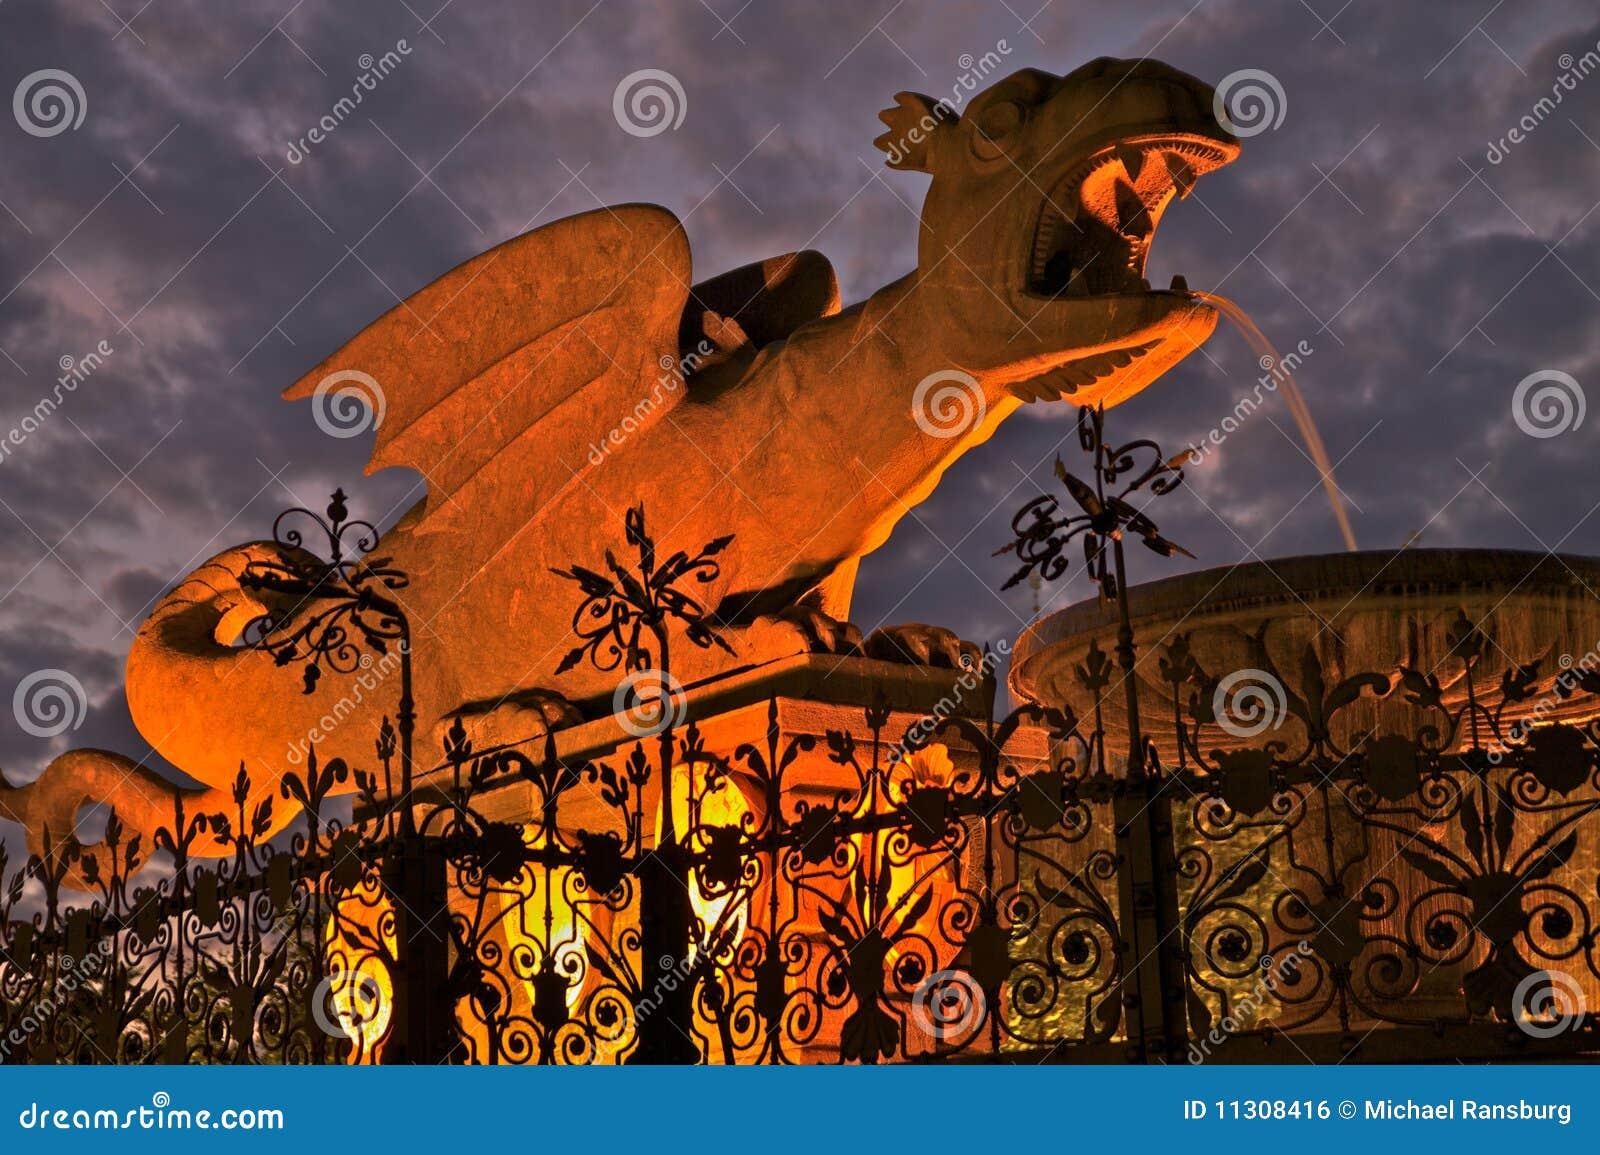 Dracheskulptur nachts